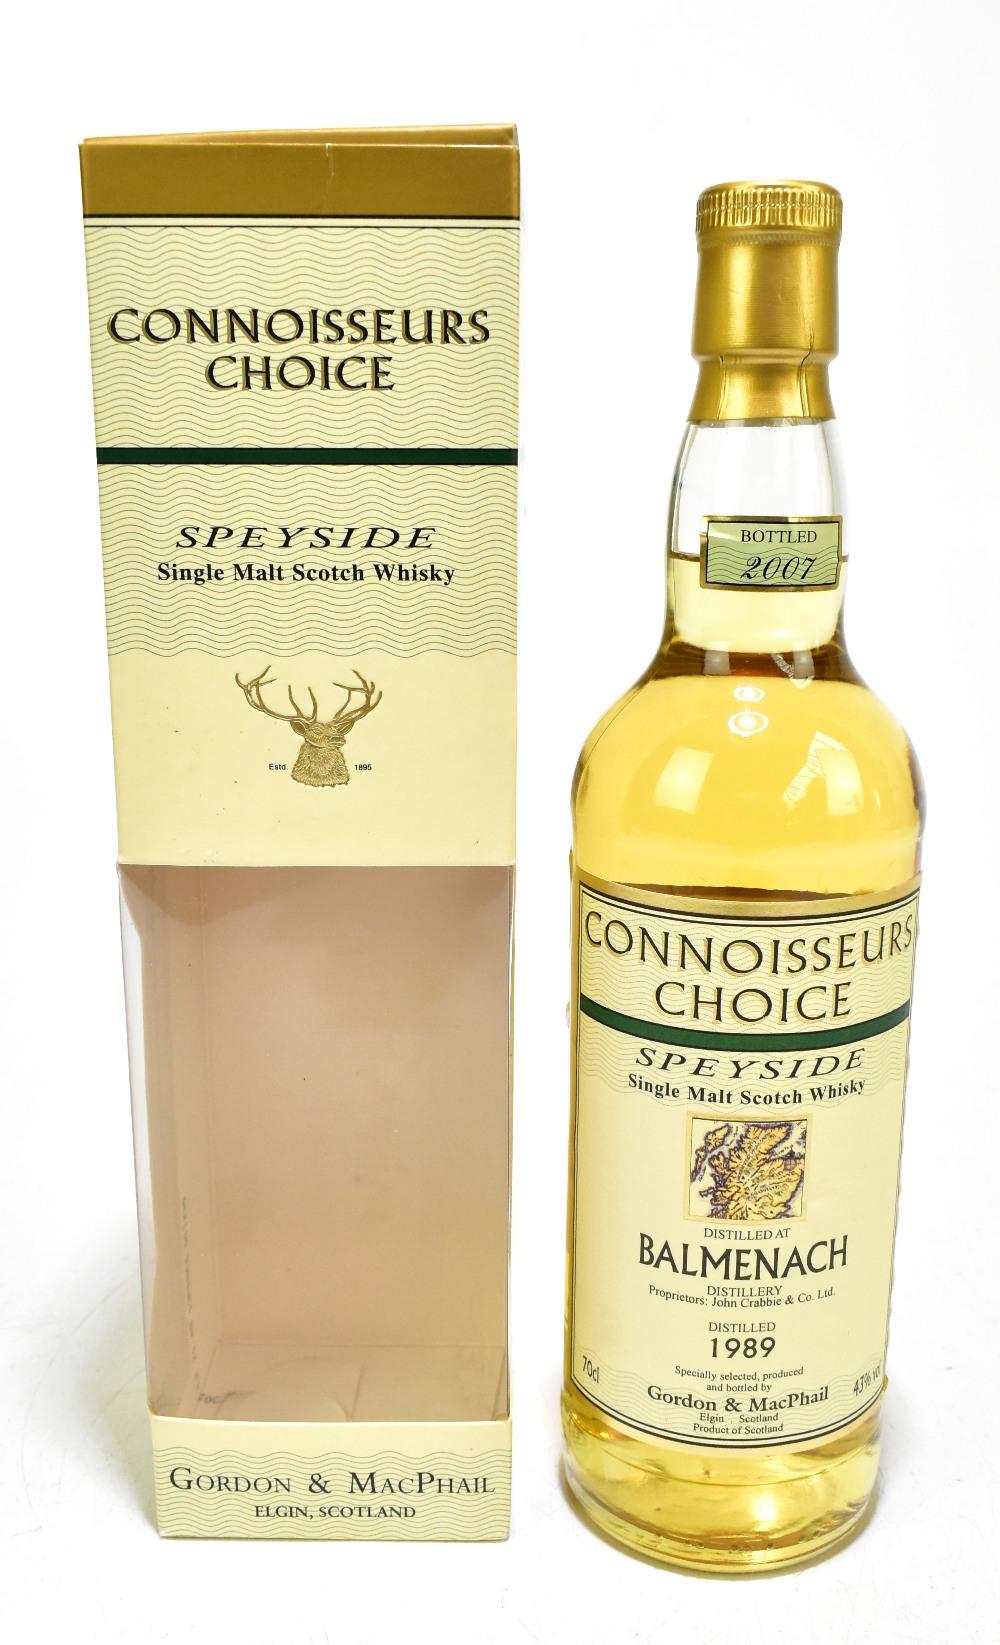 WHISKY; a single bottle of Balmenach 18 years old Speyside single malt Scotch whisky, distilled 1989